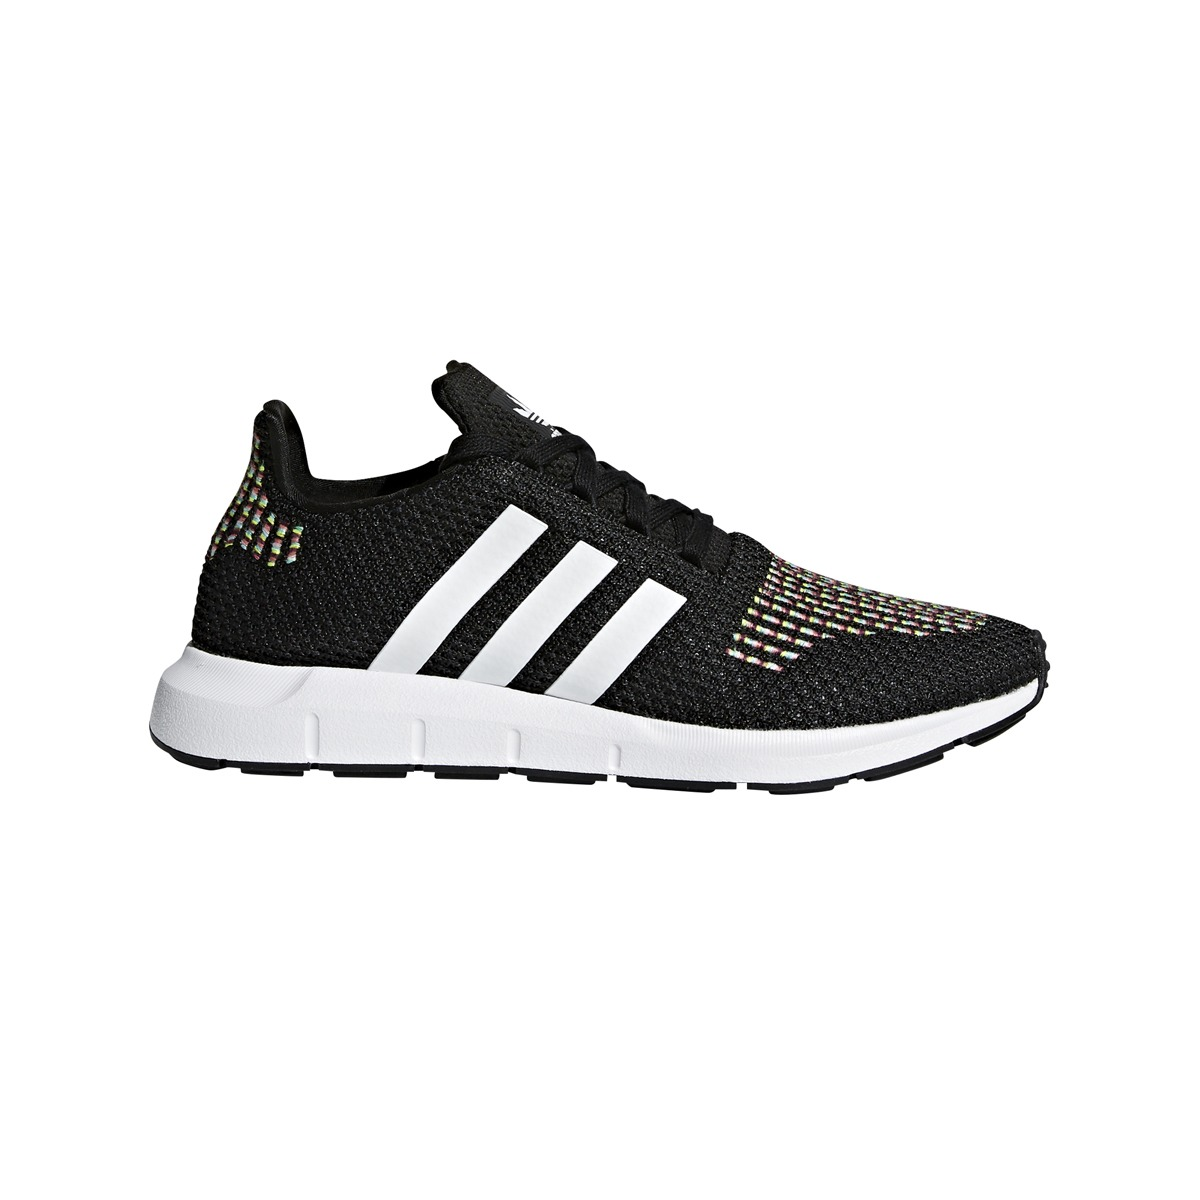 f63d1f973 zapatillas adidas originals moda swift run w mujer ng. Cargando zoom.